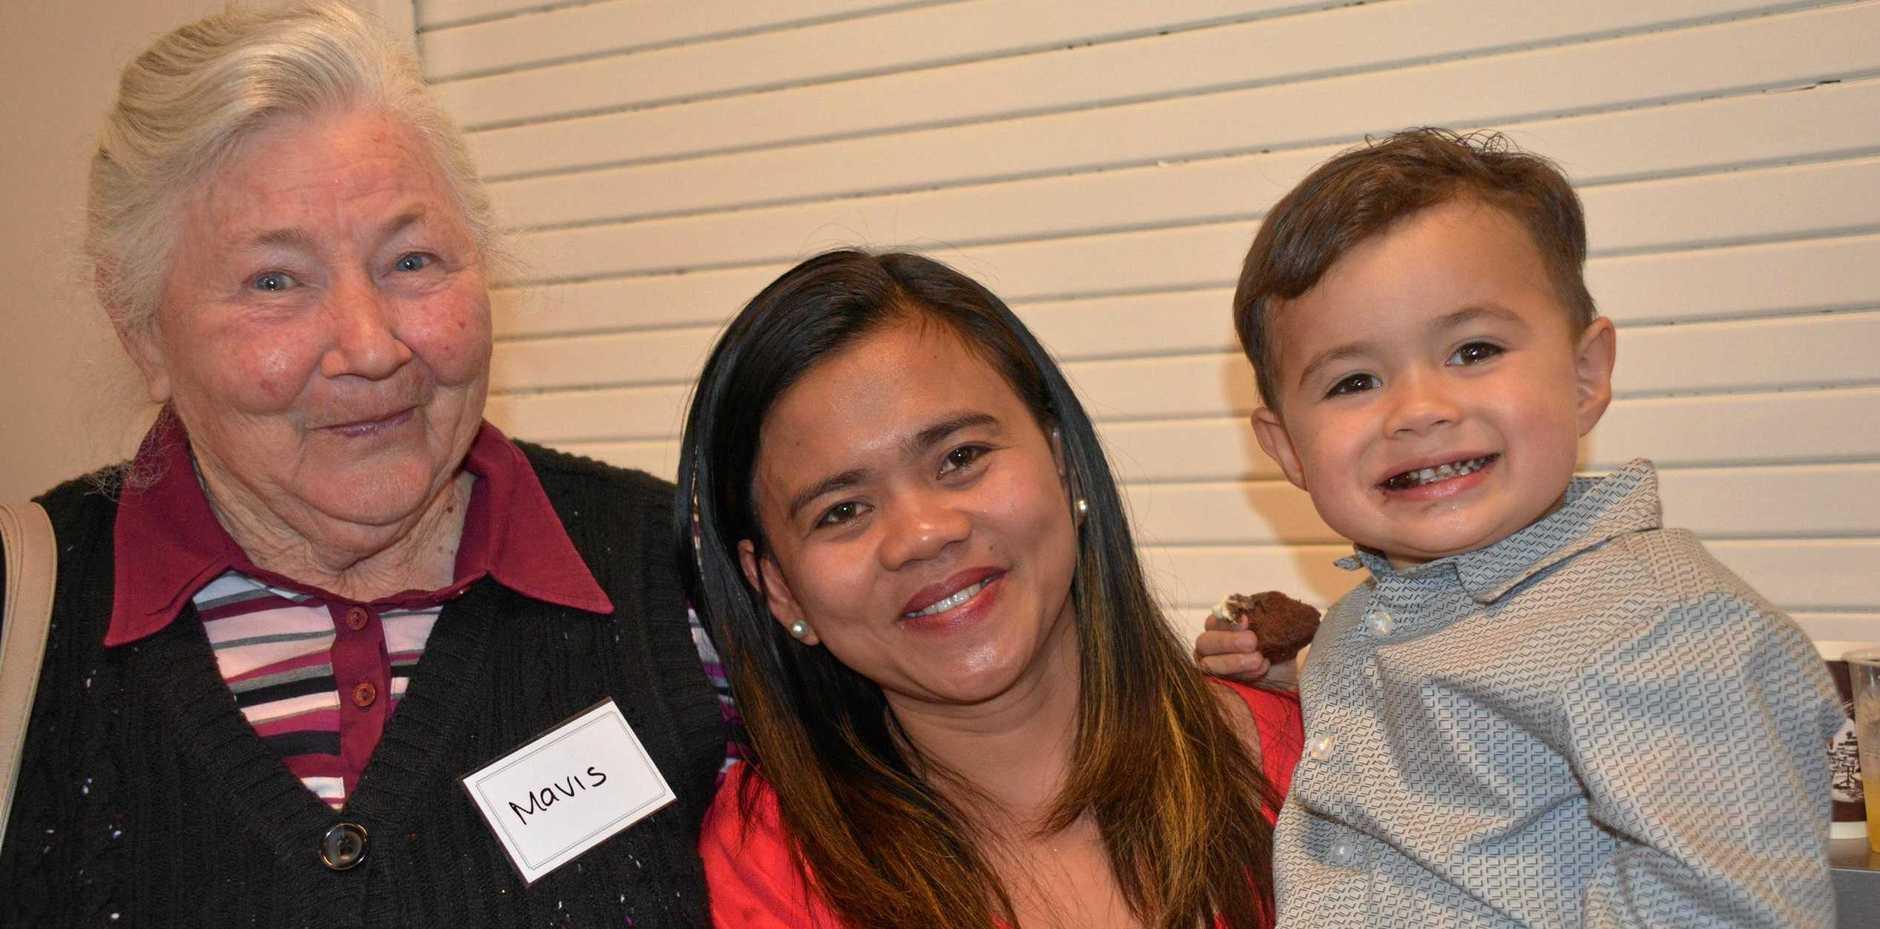 Mavis Rasmussen, Marevel and McKenzie Garland enjoy the SB Care celebrations.